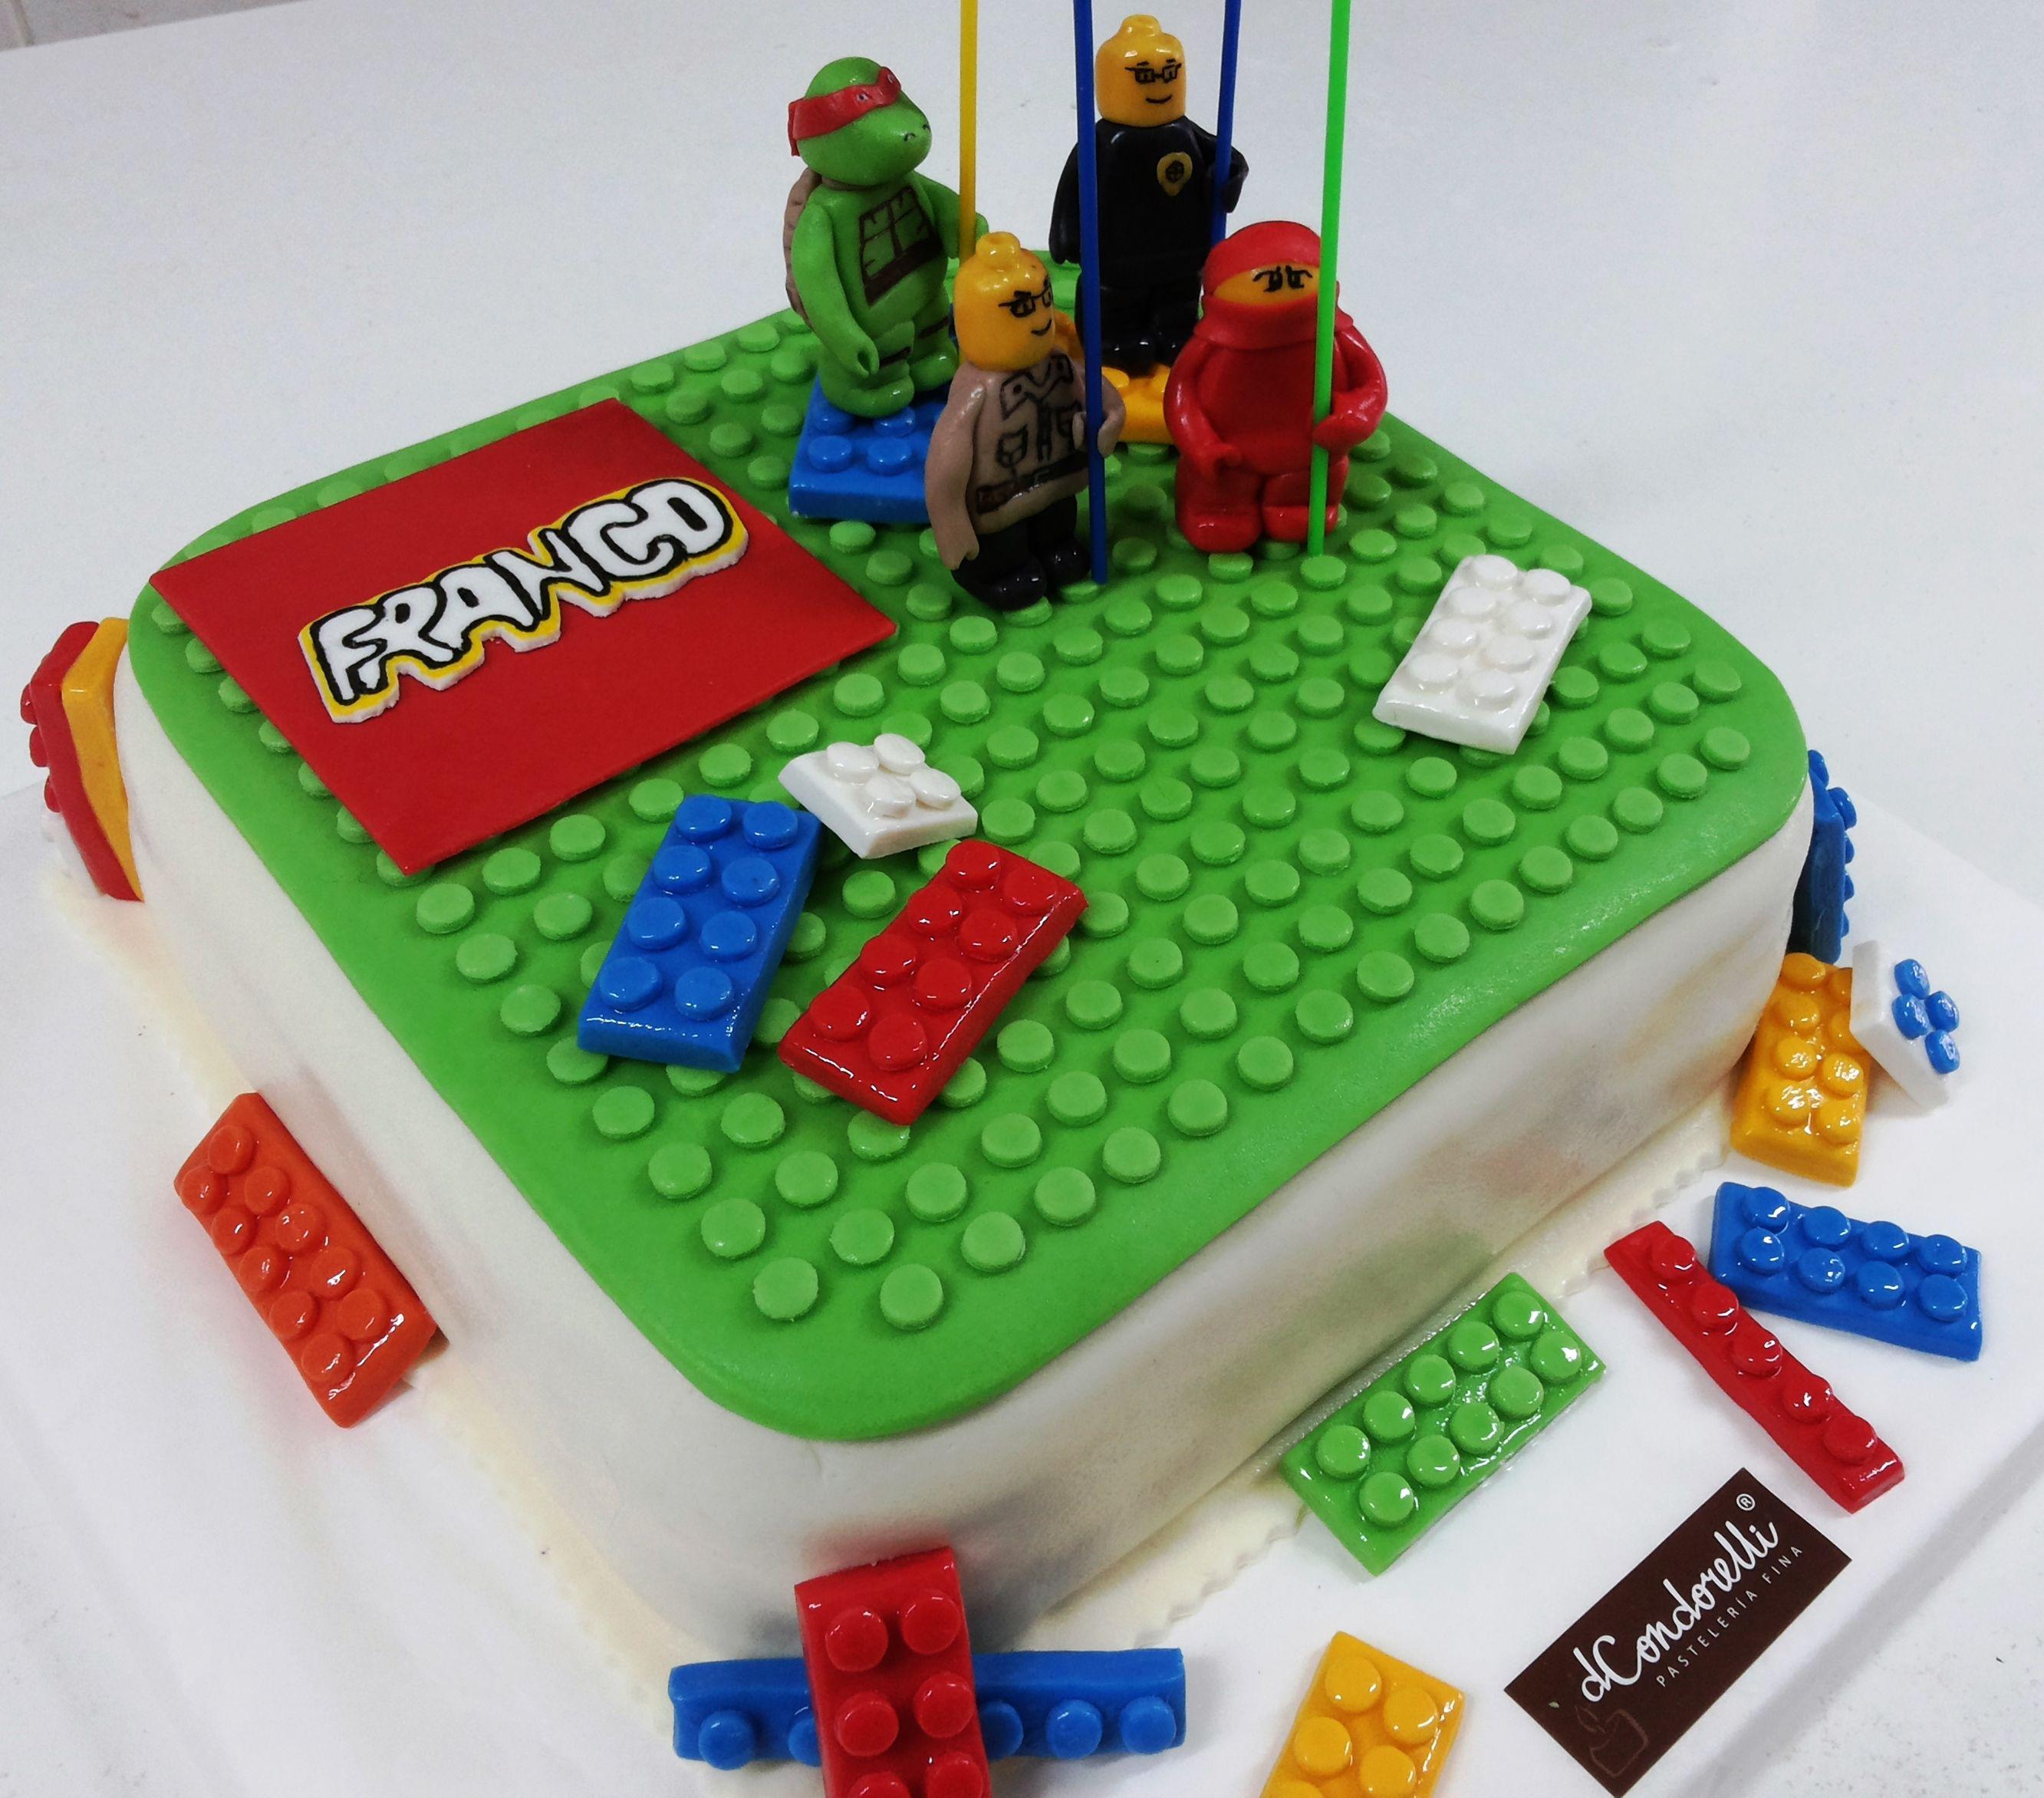 Torta para ni os lego de pasteler a dcondorelli www - Construcciones de lego para ninos ...